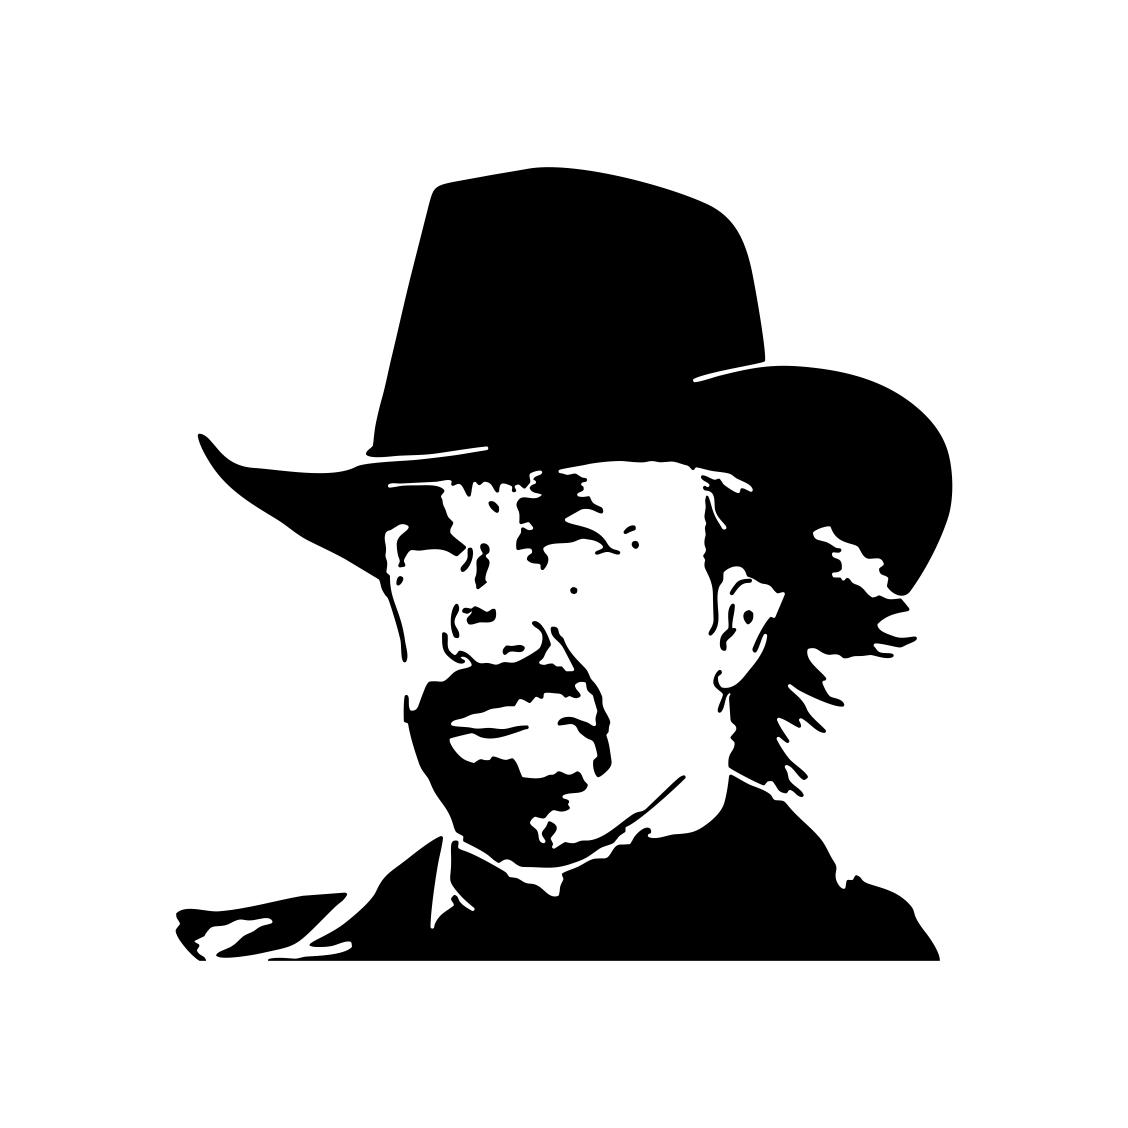 Chuck Norris Texas Cowboy graphics design SVG Vector Art Clipart instant  downloads Digital Cut Print Files shirt Decal cricut.